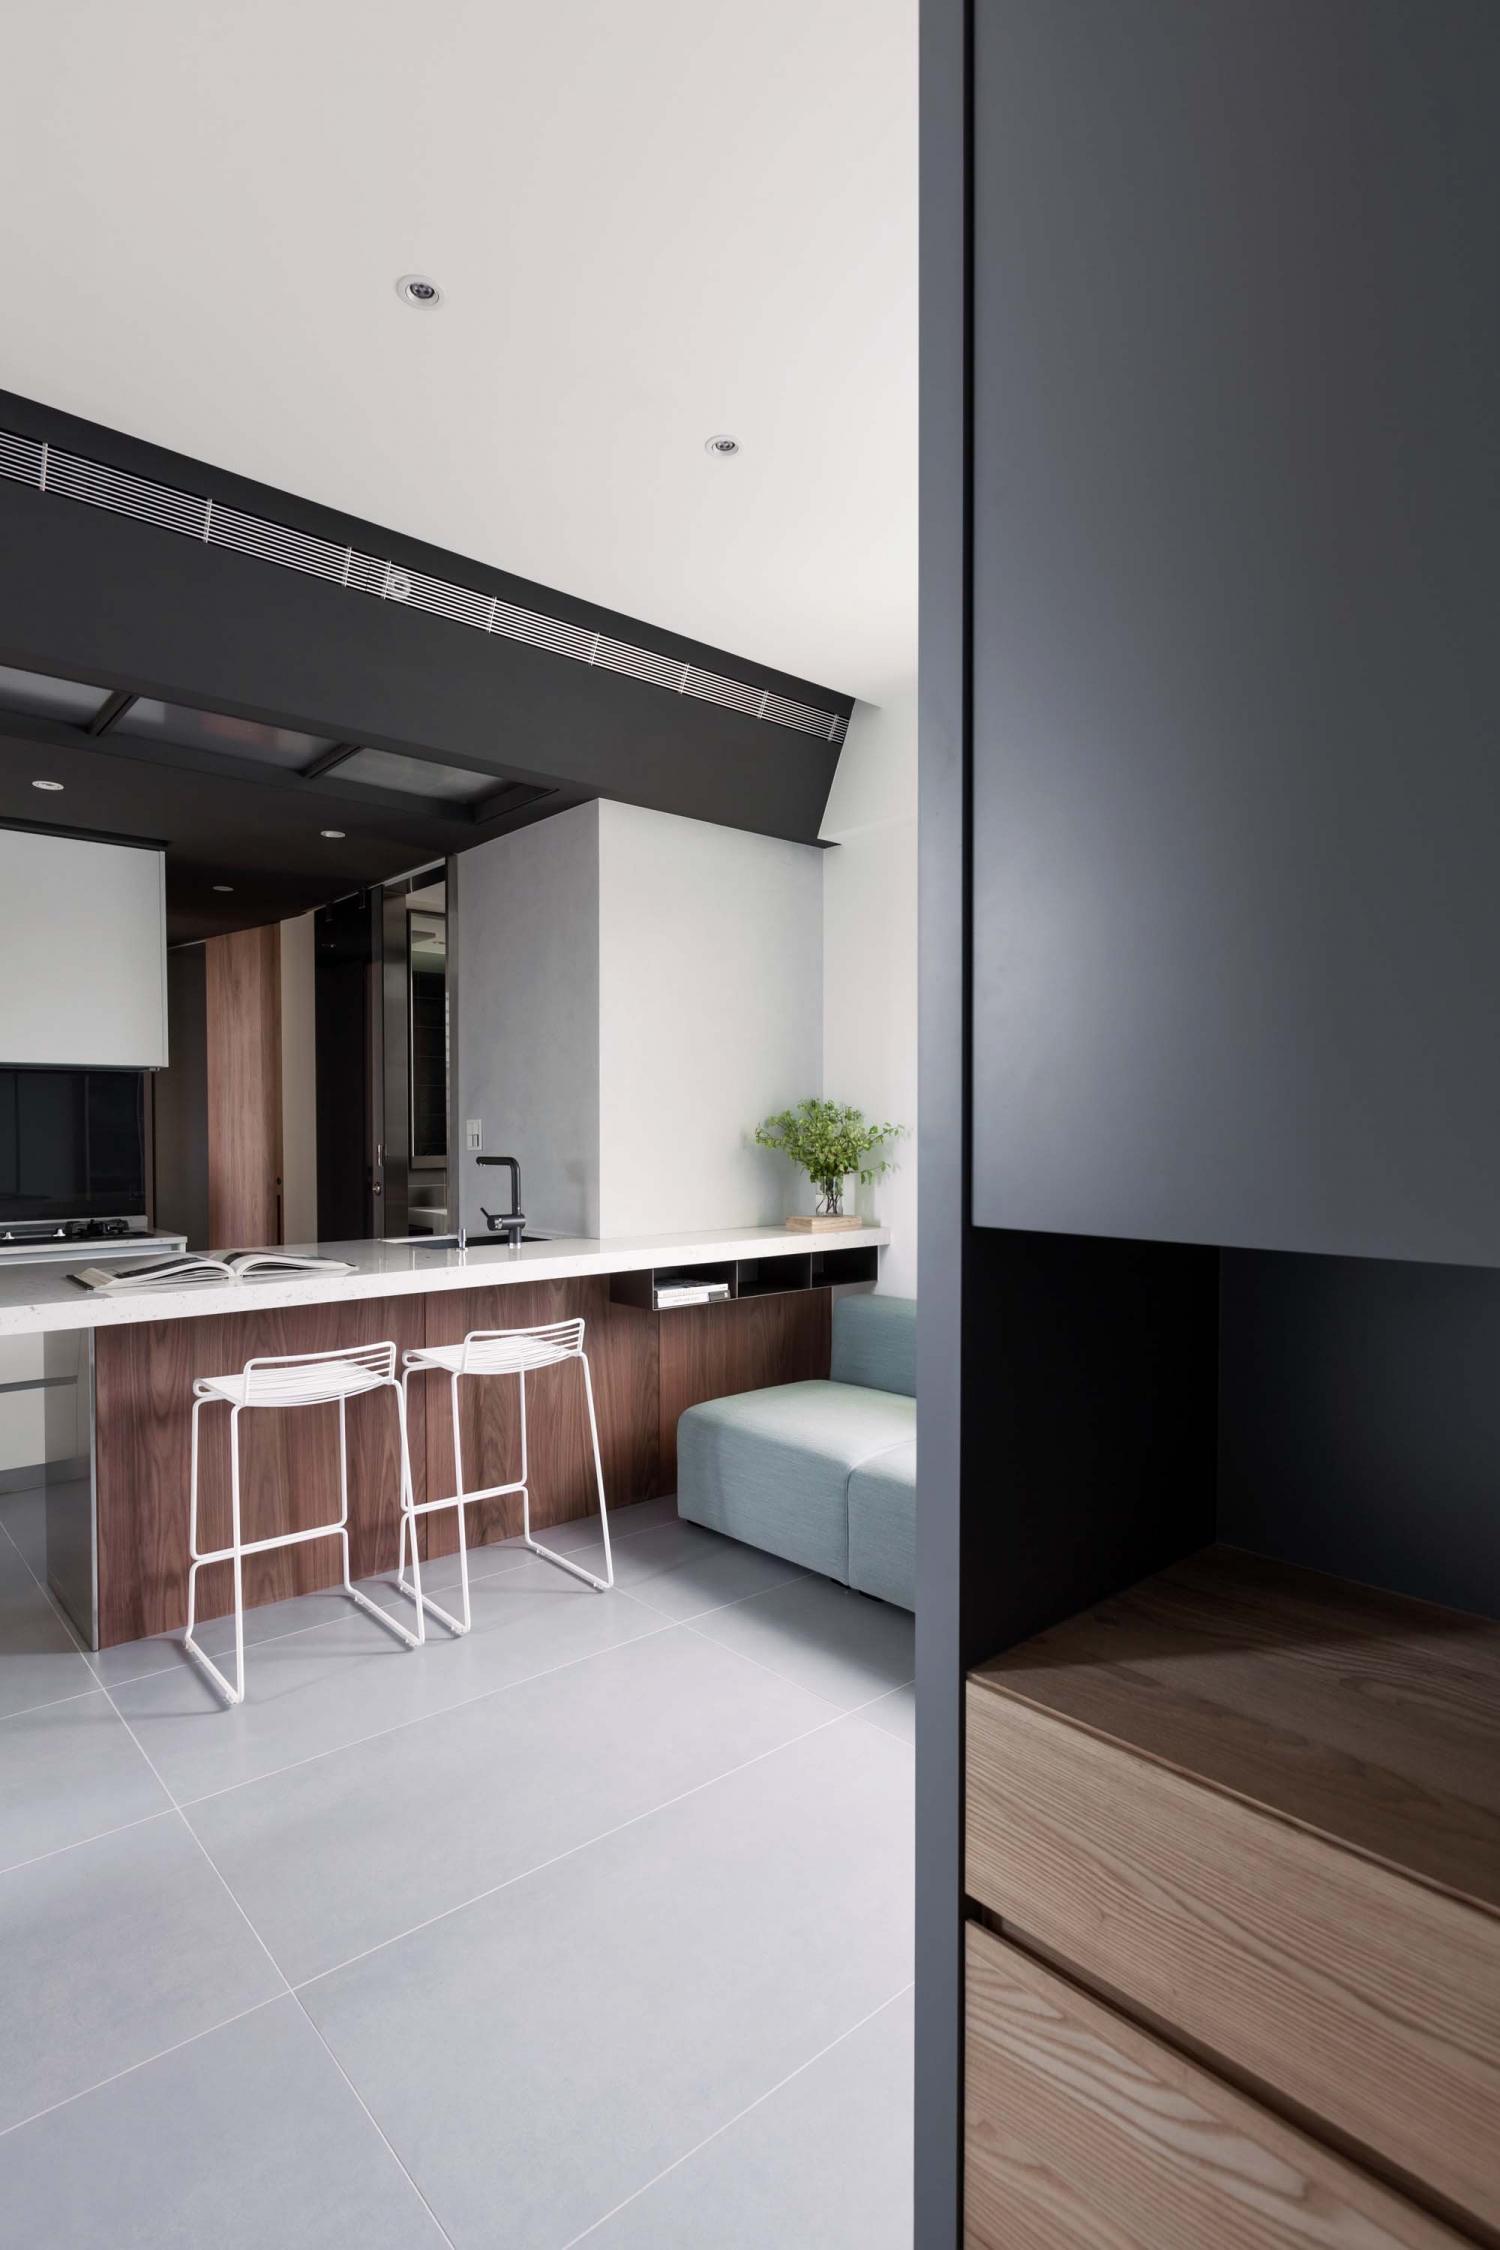 Interior Image 201